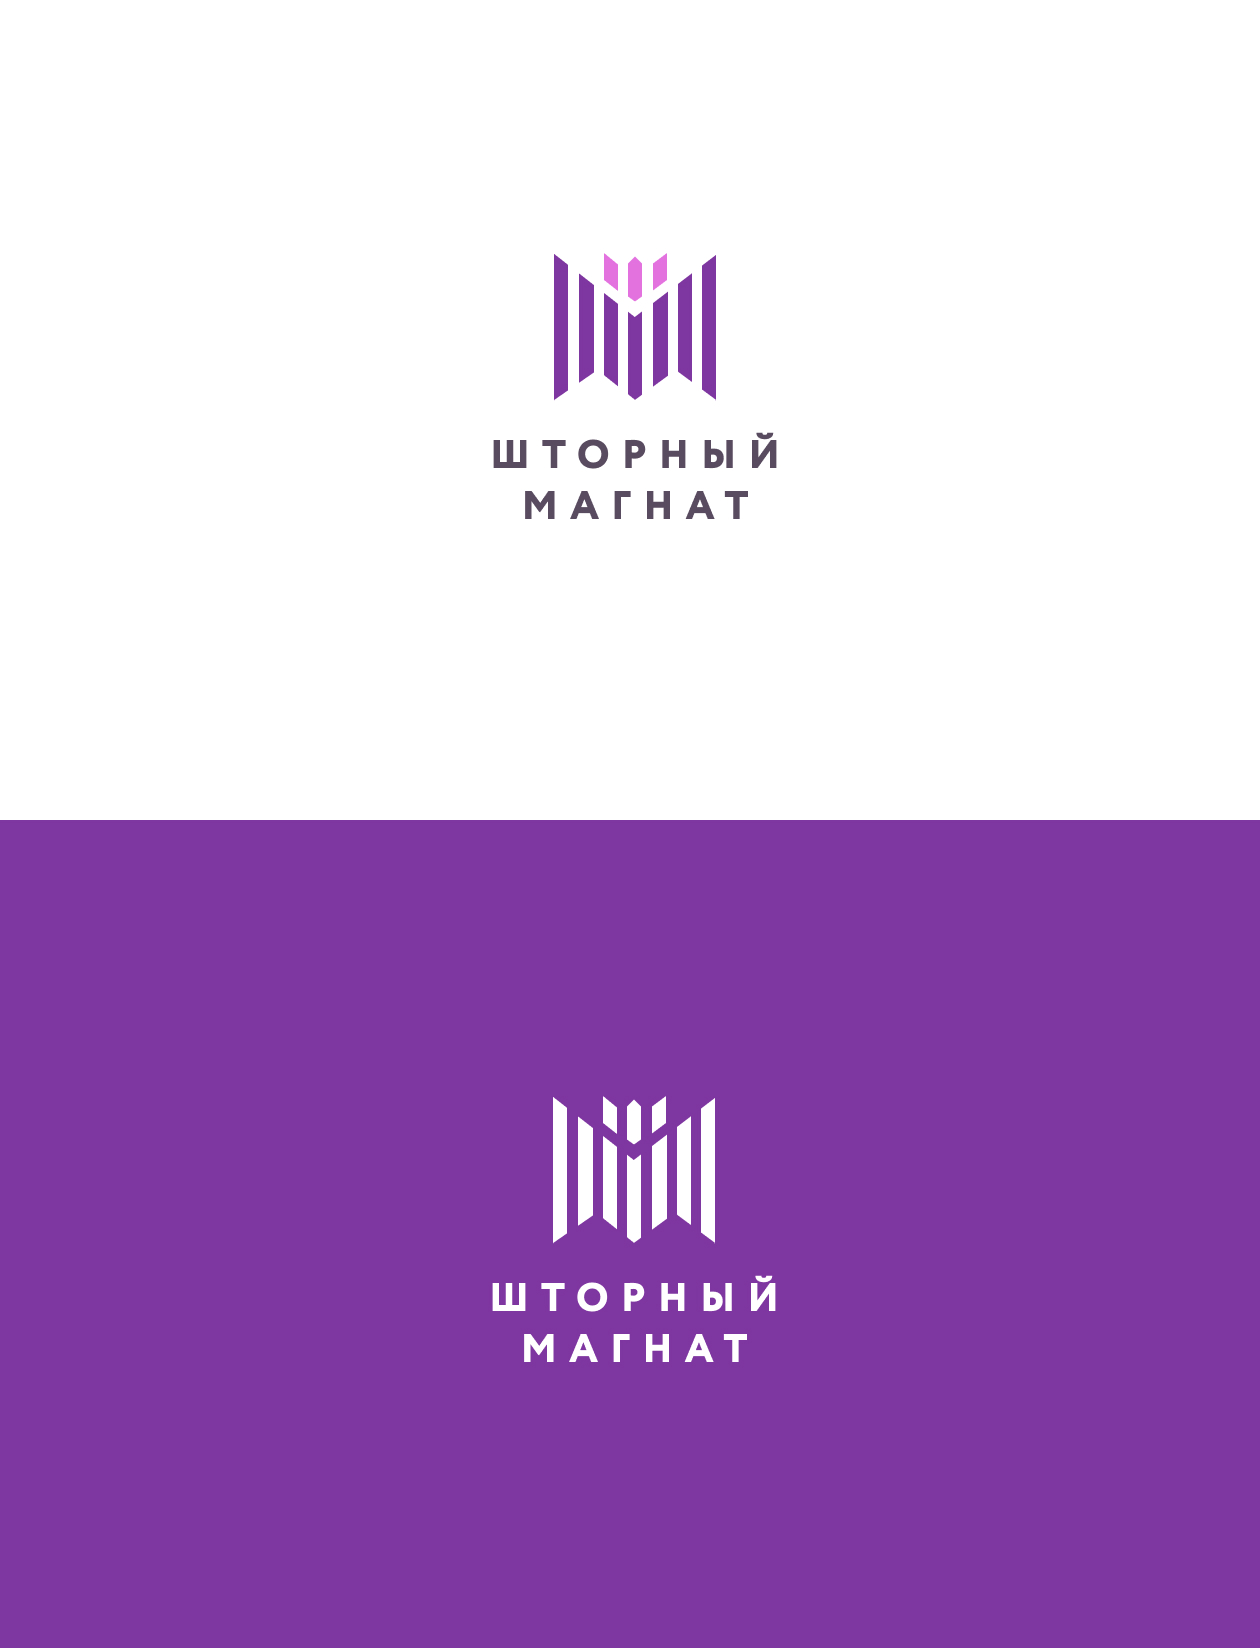 Логотип и фирменный стиль для магазина тканей. фото f_7255cdc24f361612.jpg